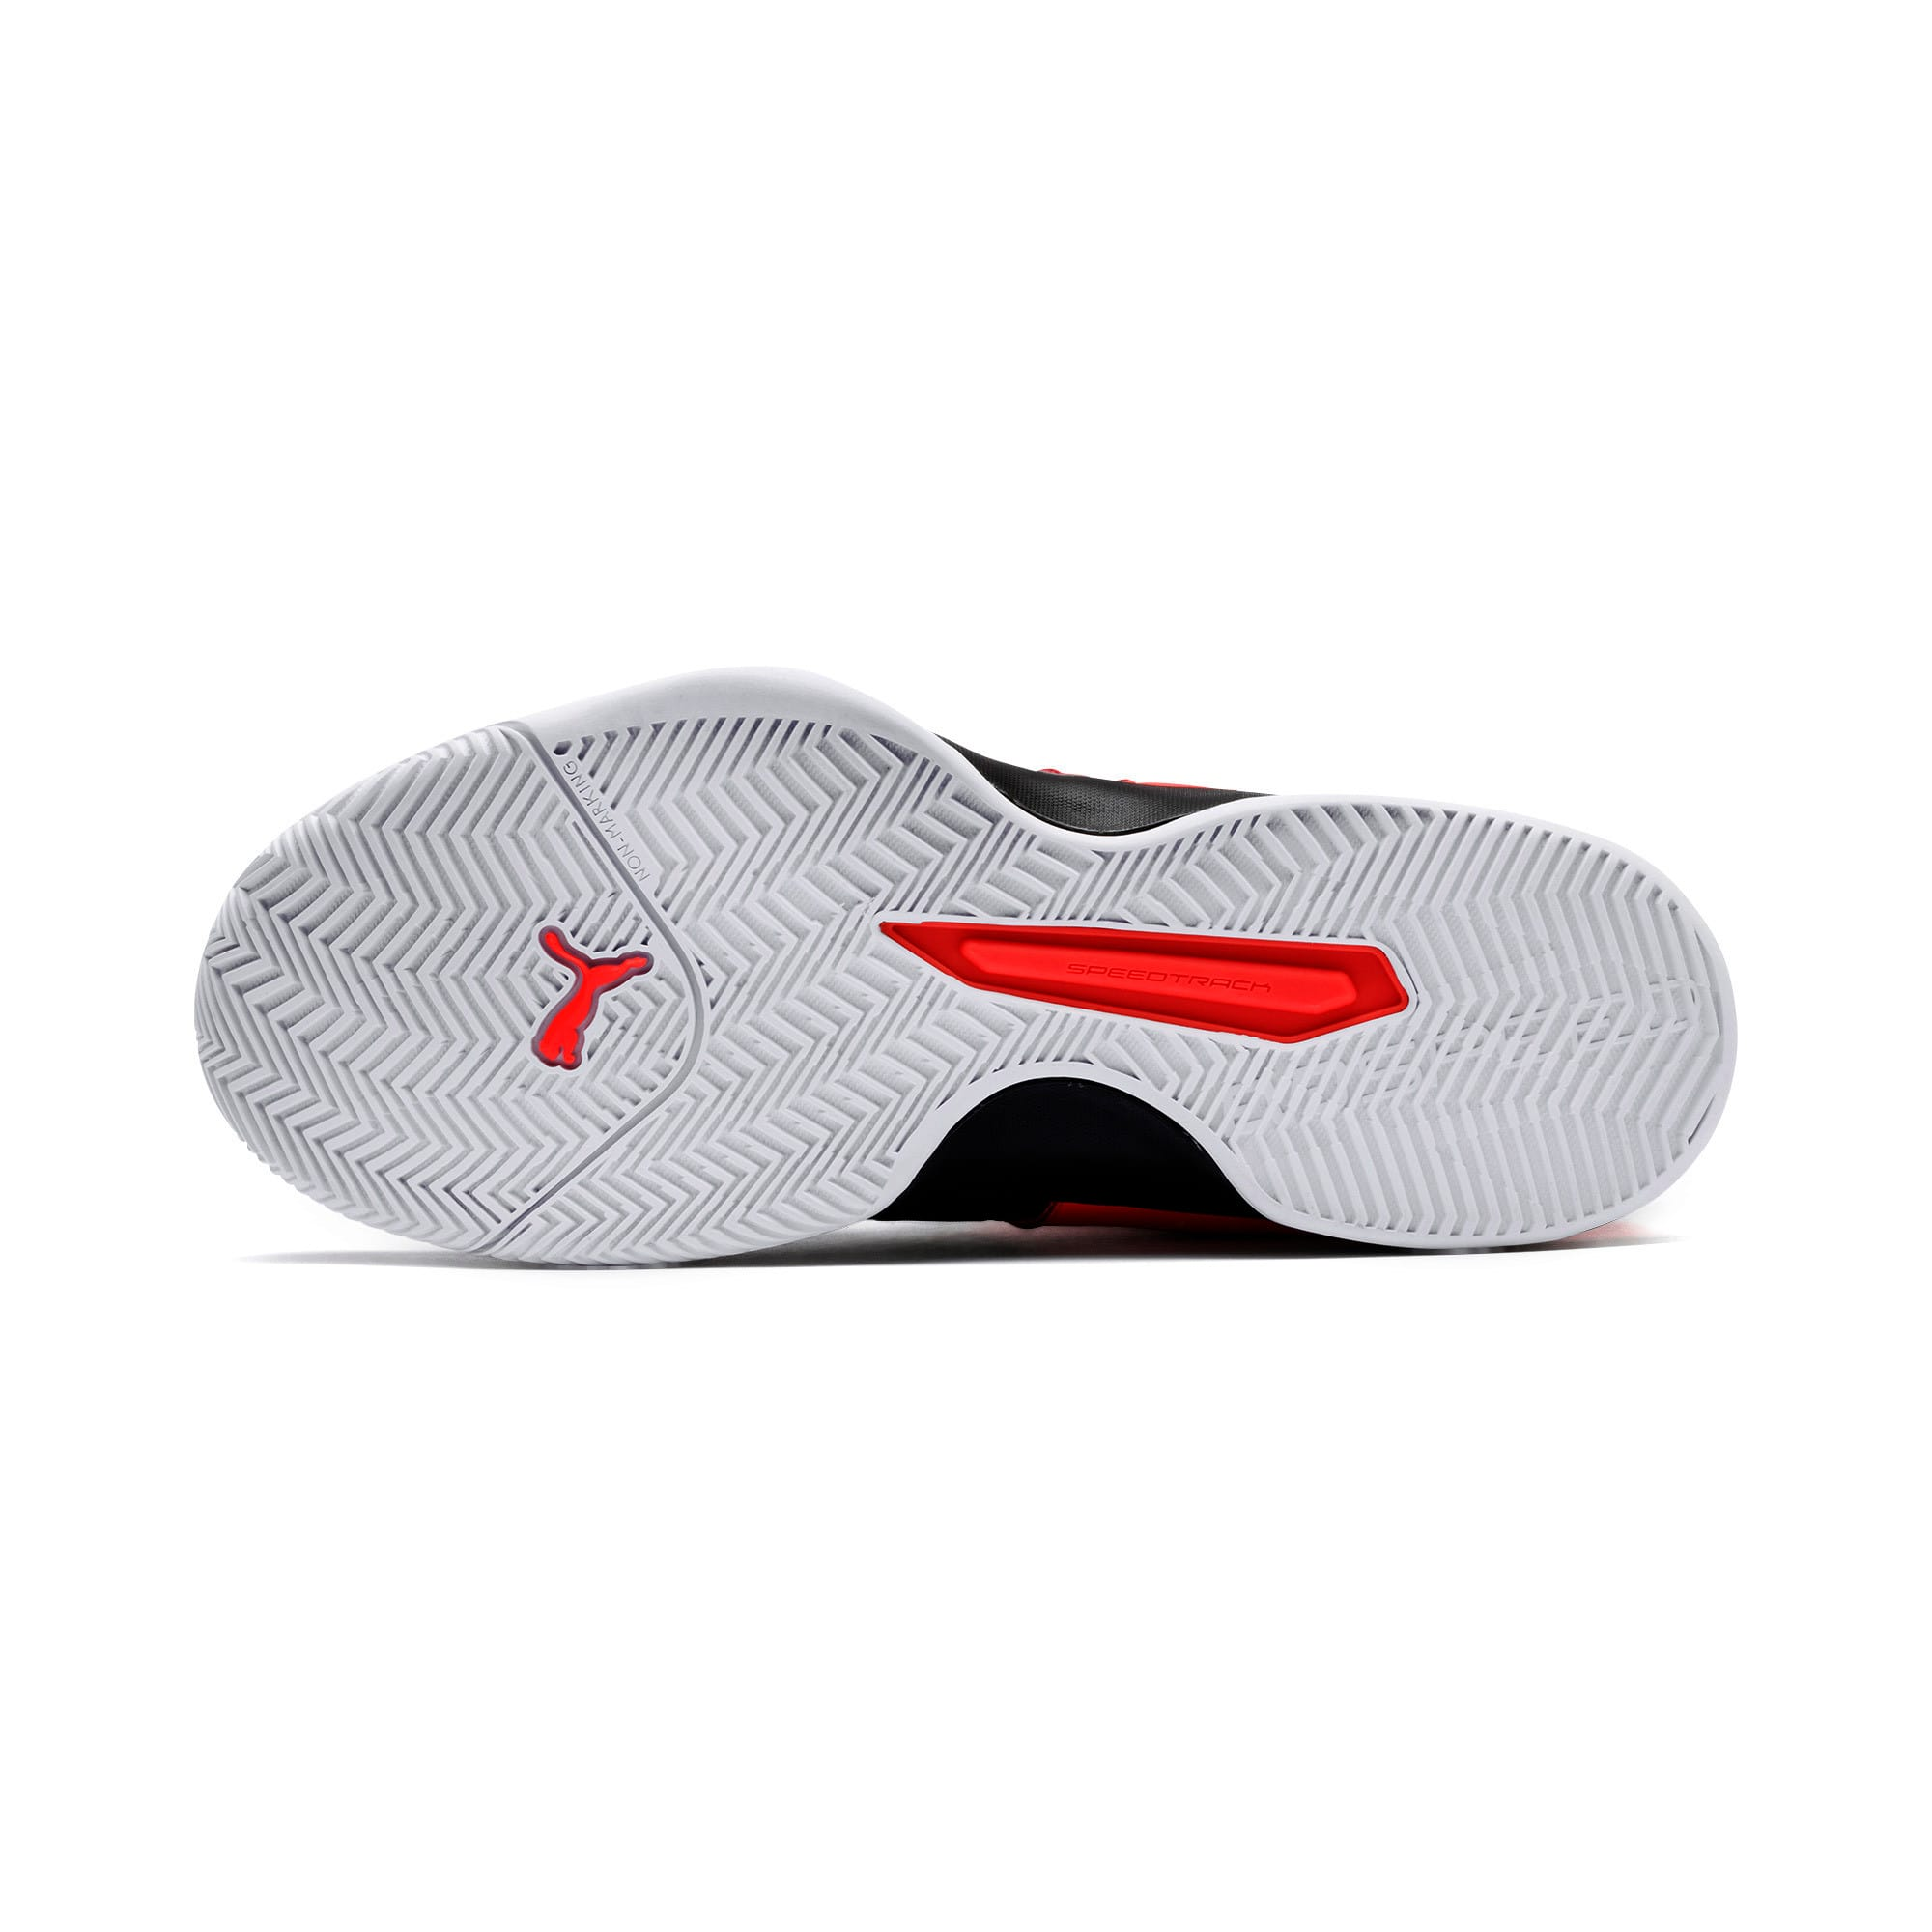 Thumbnail 5 of Boundless sportschoenen voor heren, Black-Nrgy Red-Puma White, medium